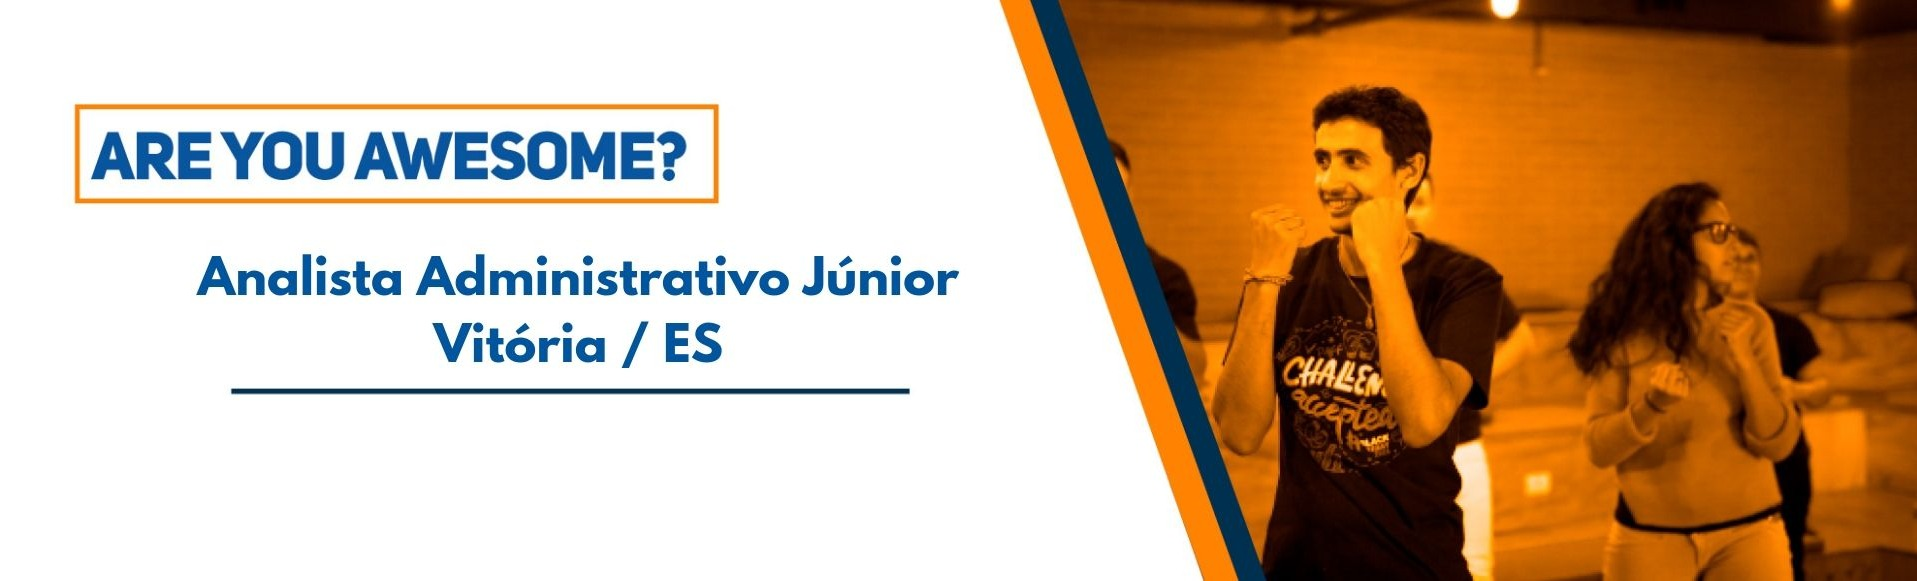 Analista Administrativo Júnior